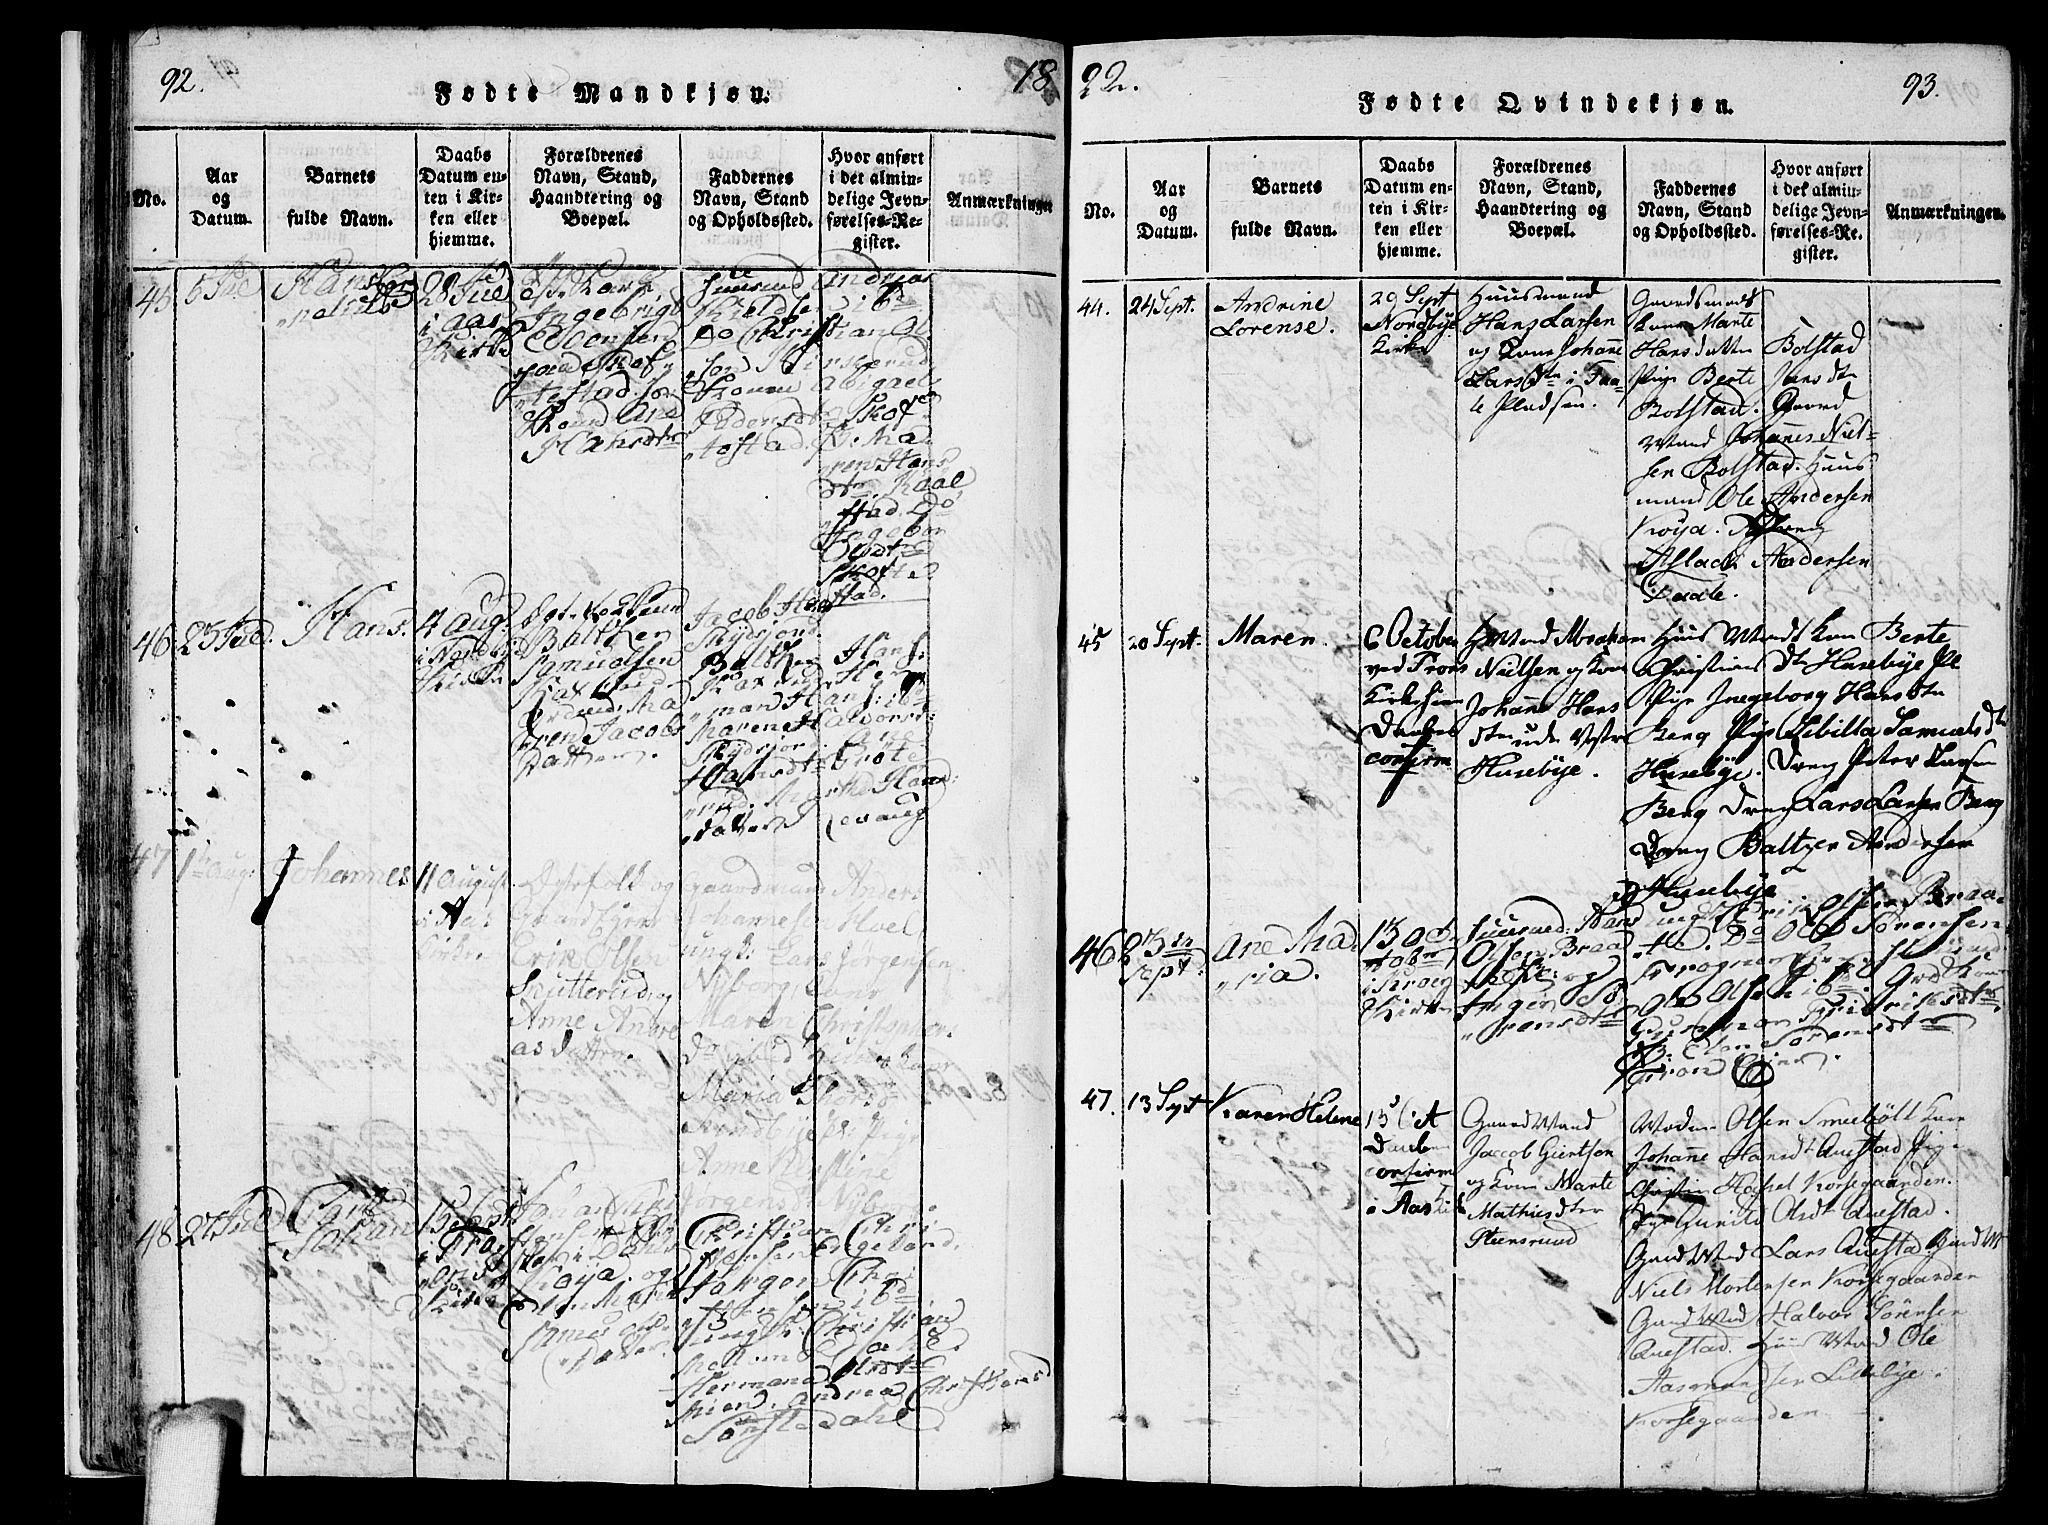 SAO, Ås prestekontor Kirkebøker, F/Fa/L0004: Ministerialbok nr. I 4, 1818-1826, s. 92-93